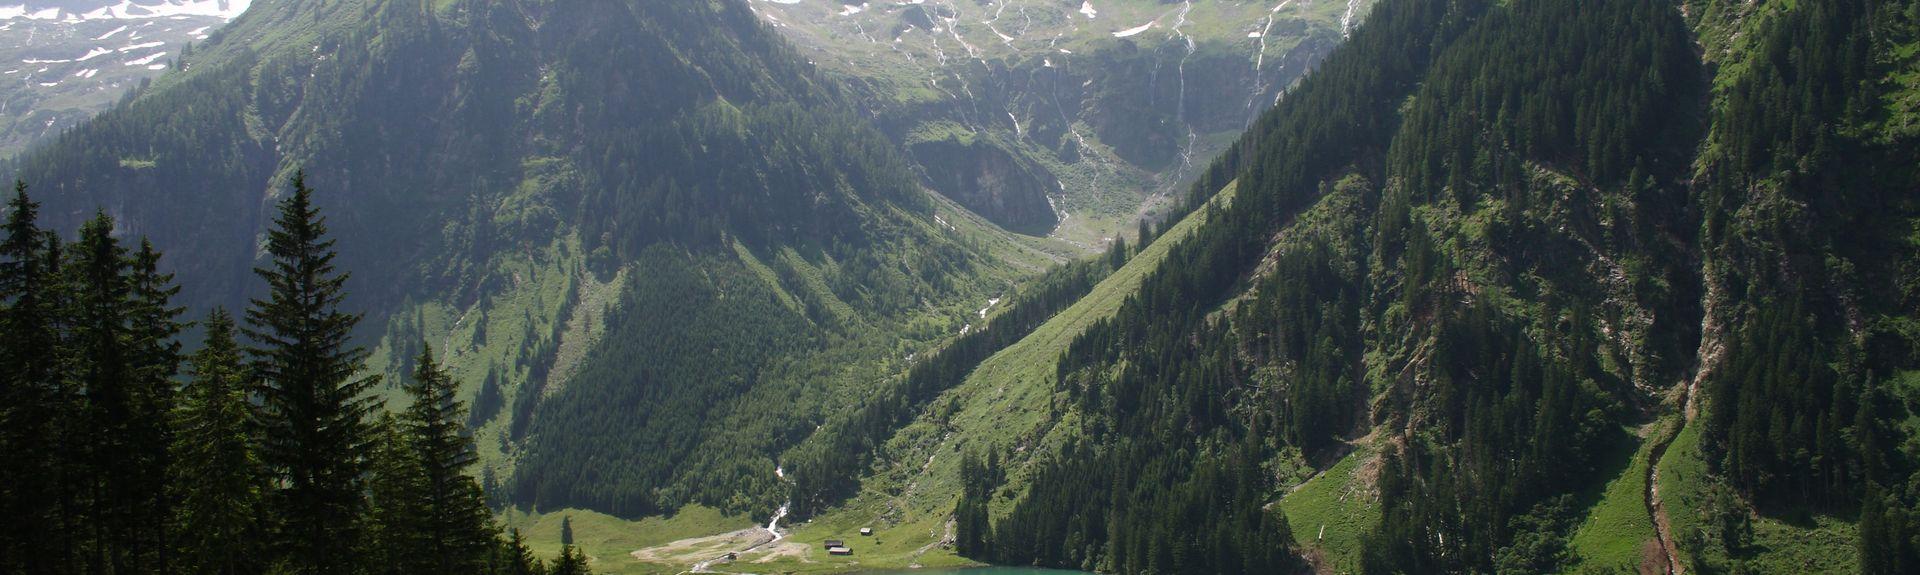 Pürgg-Trautenfels, Austria